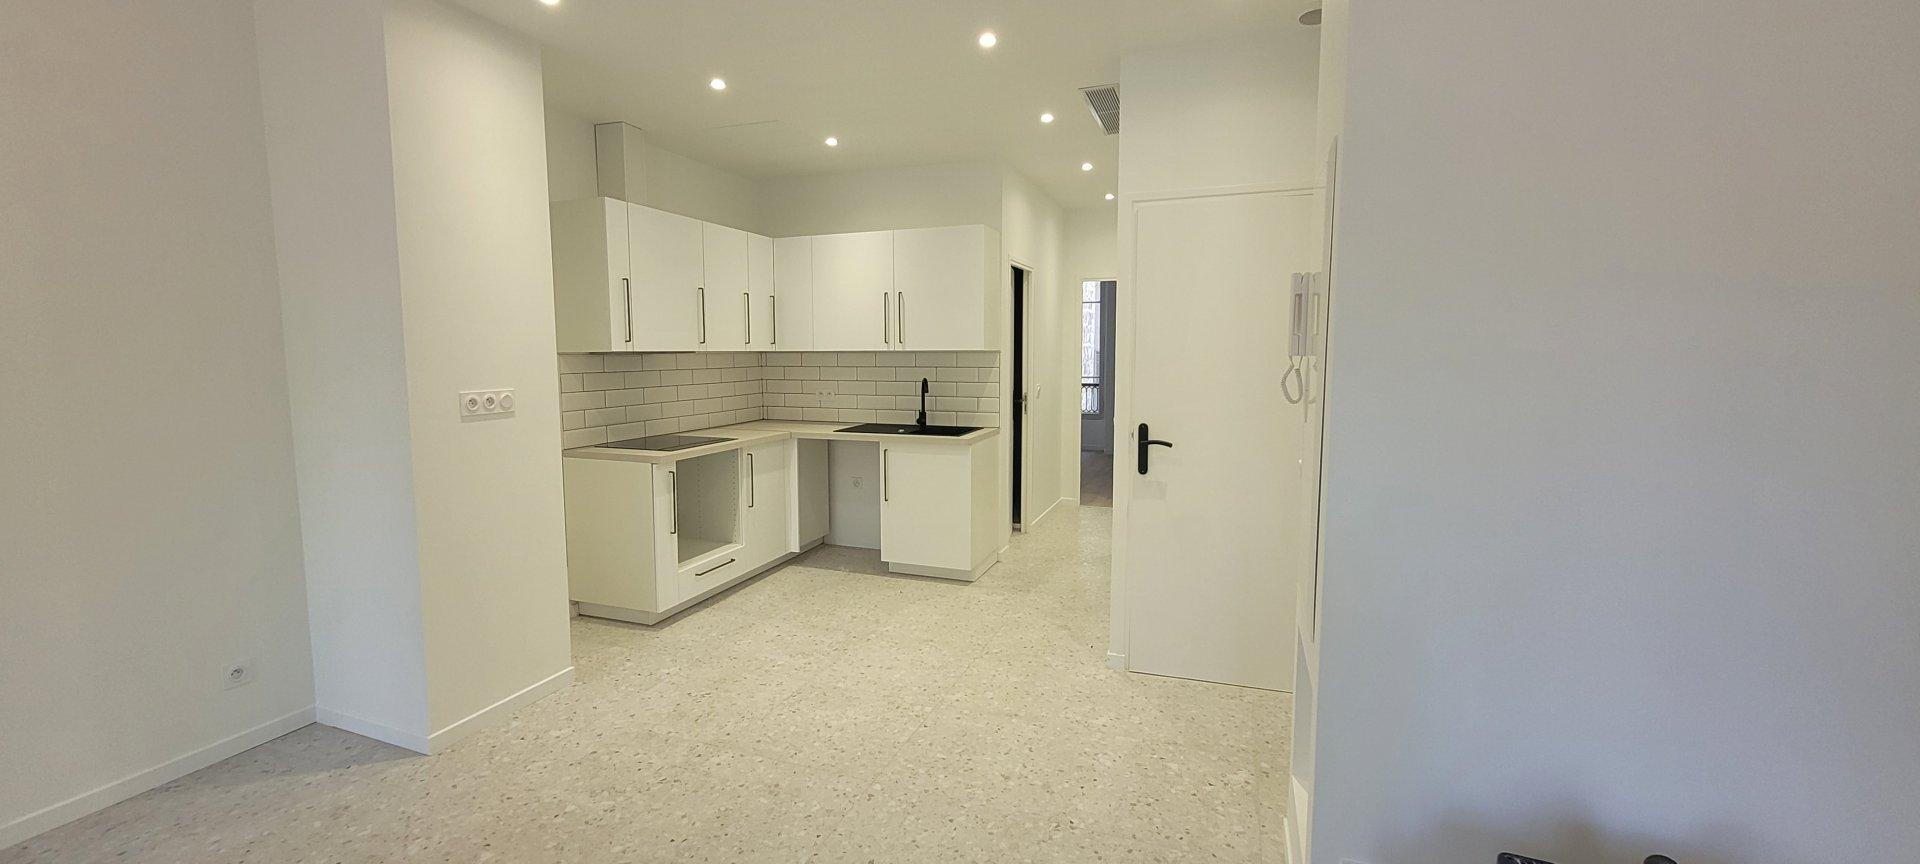 Vendita Appartamento - Nizza (Nice) Carabacel